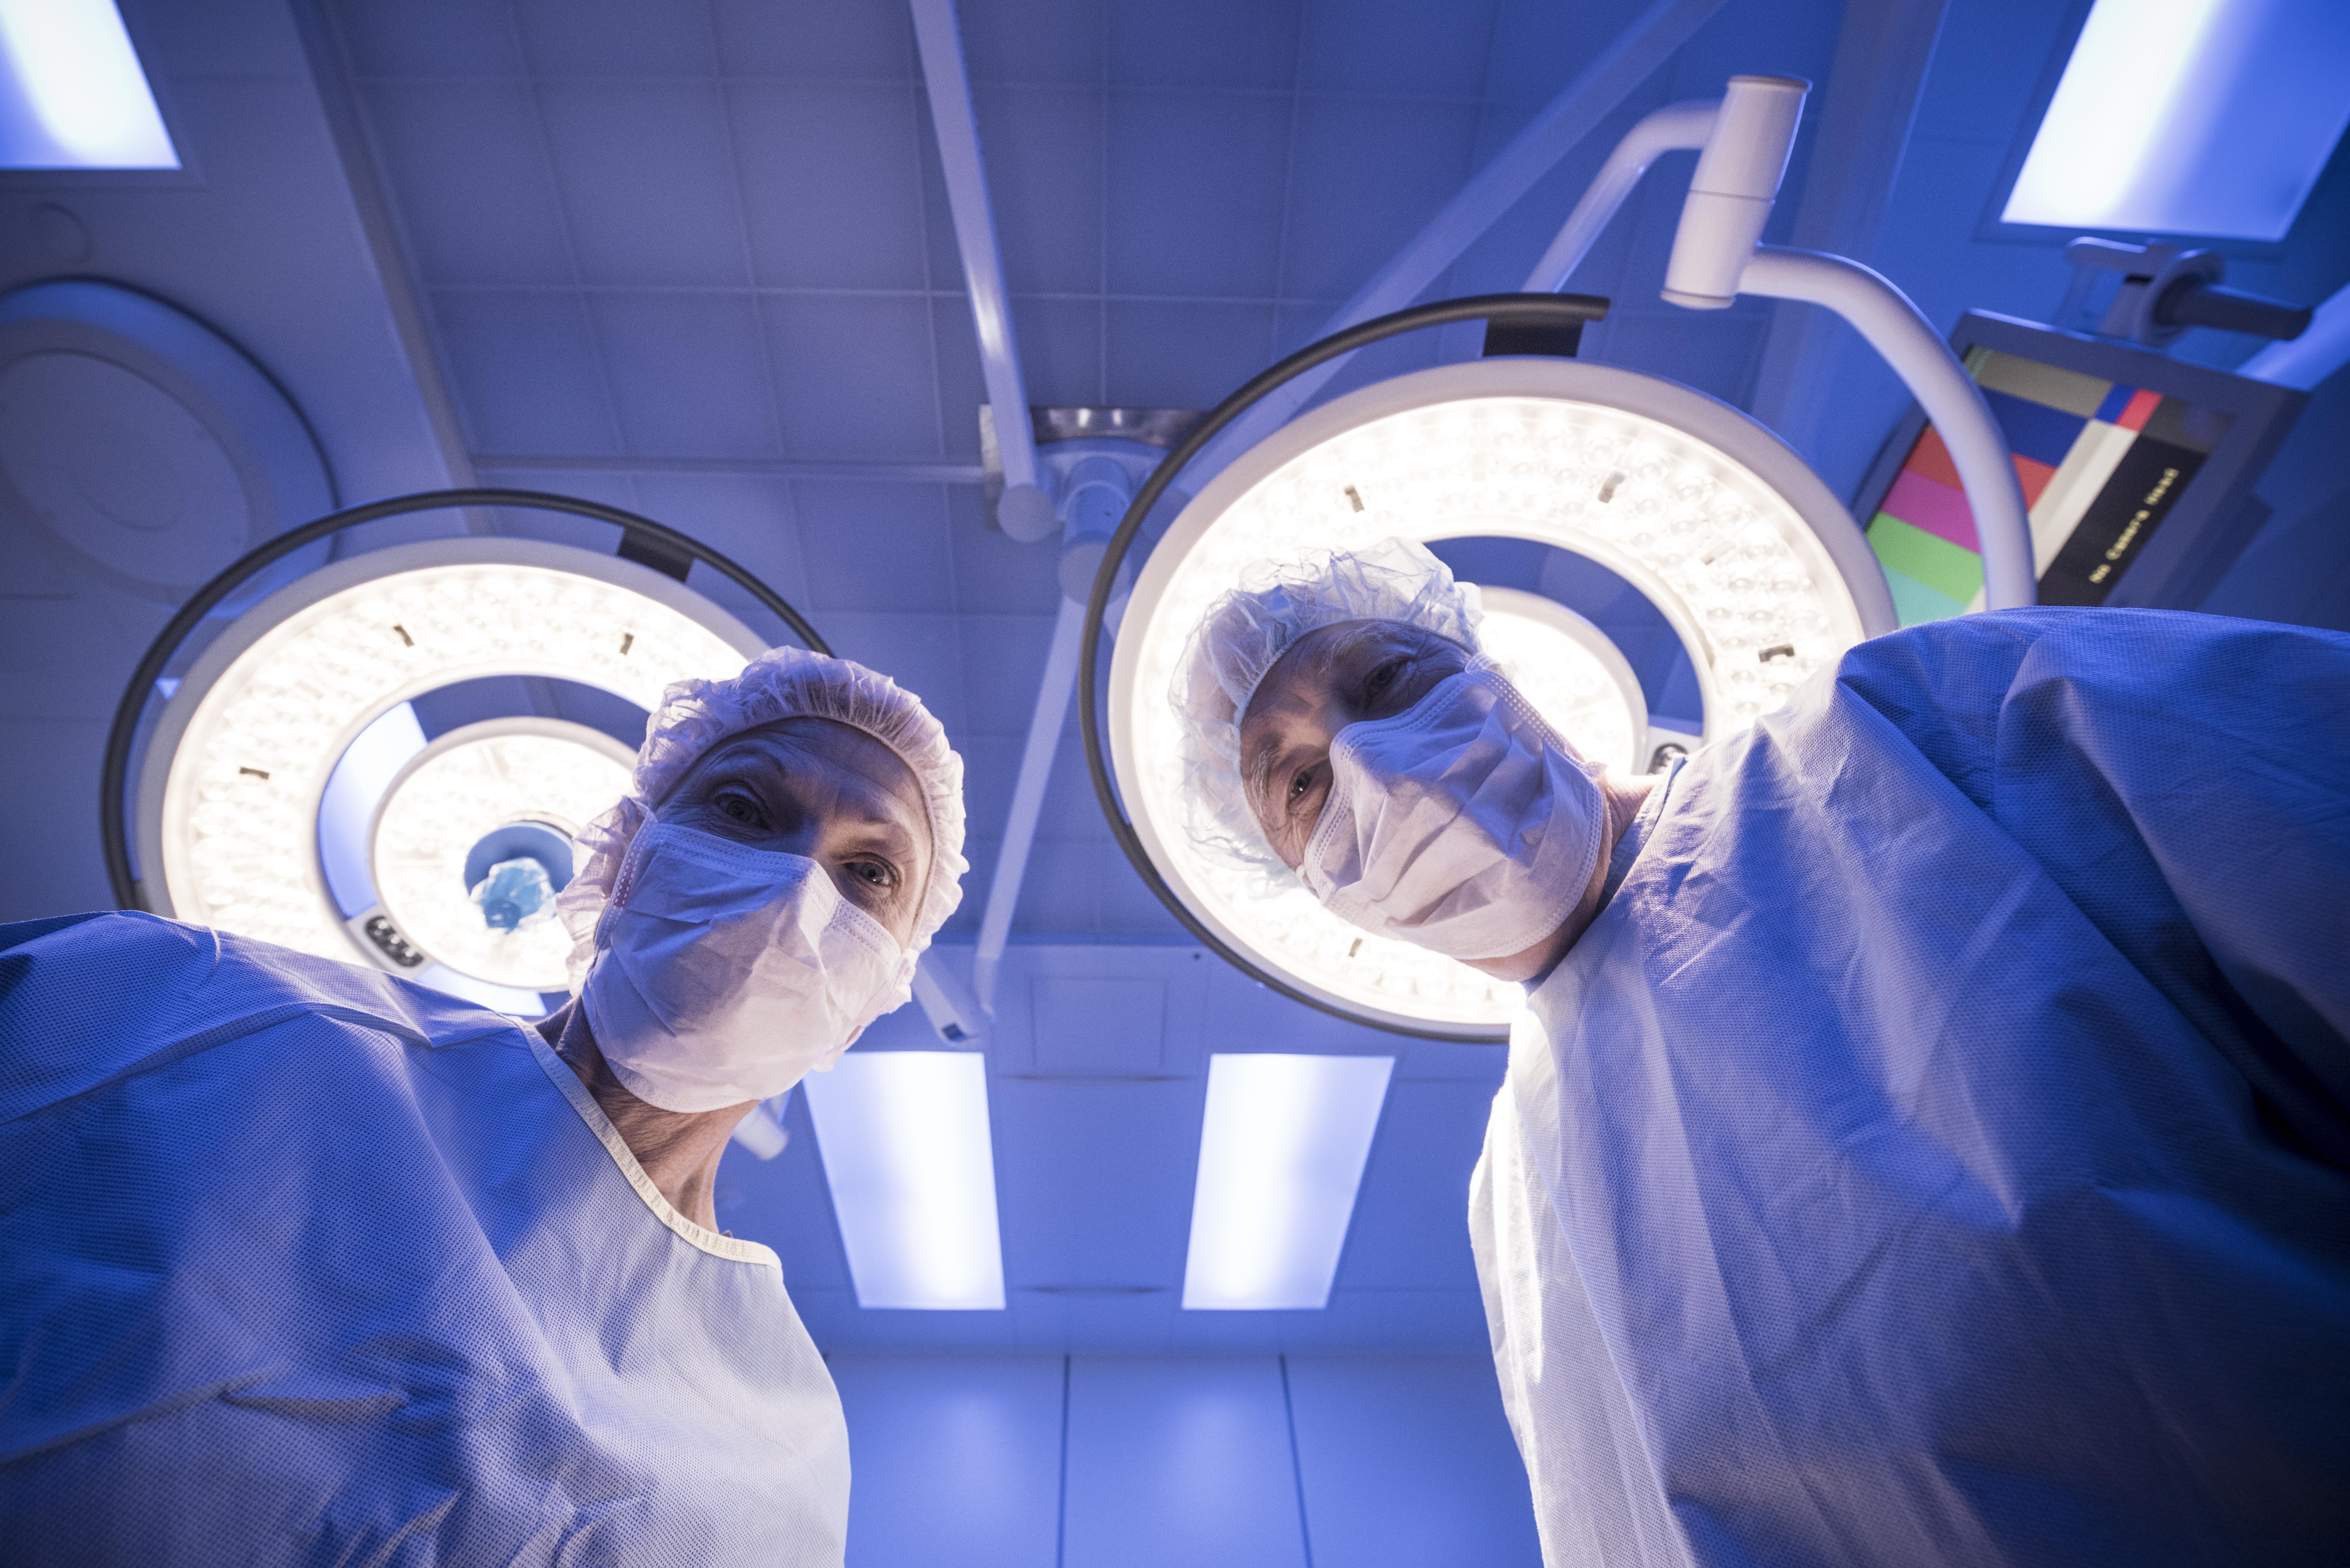 Surgeon medical indemnity insurance